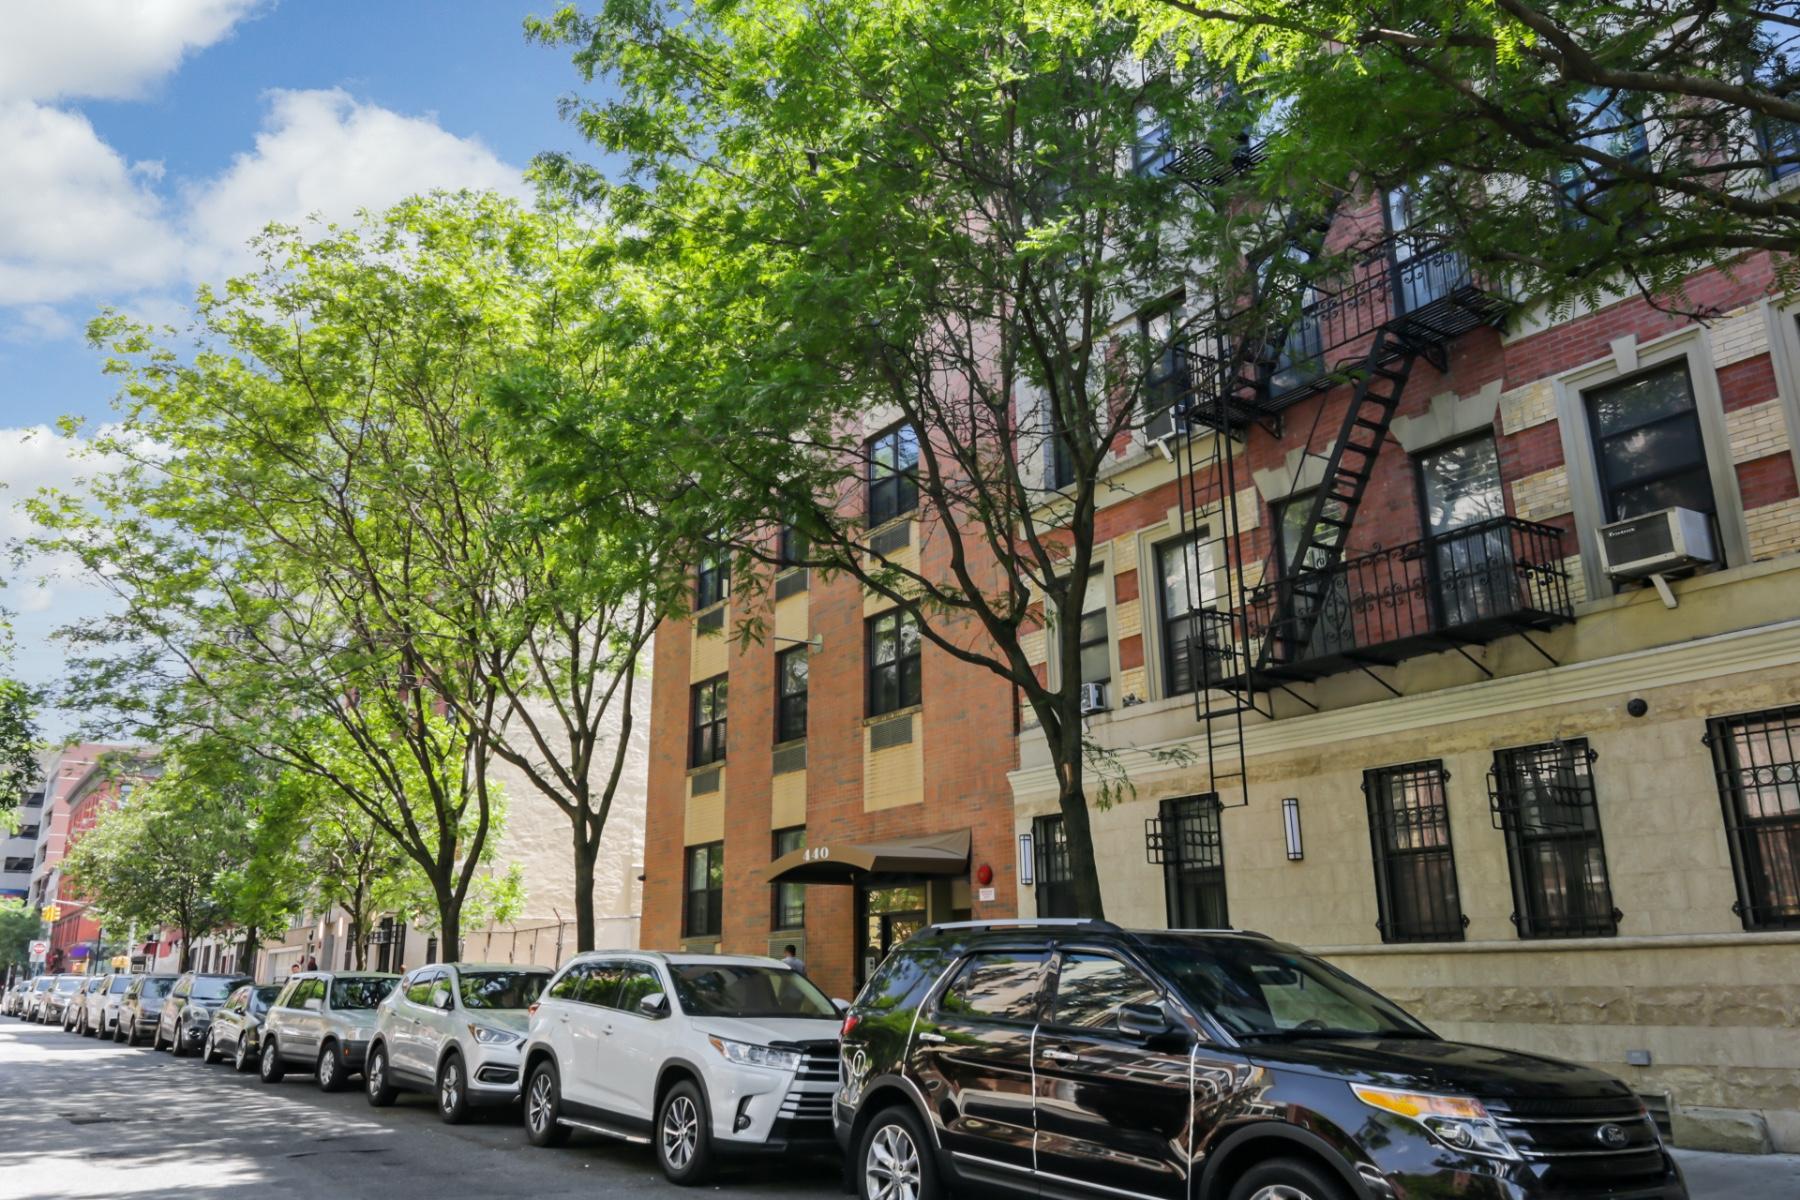 440 East 117th Street East Harlem New York NY 10035